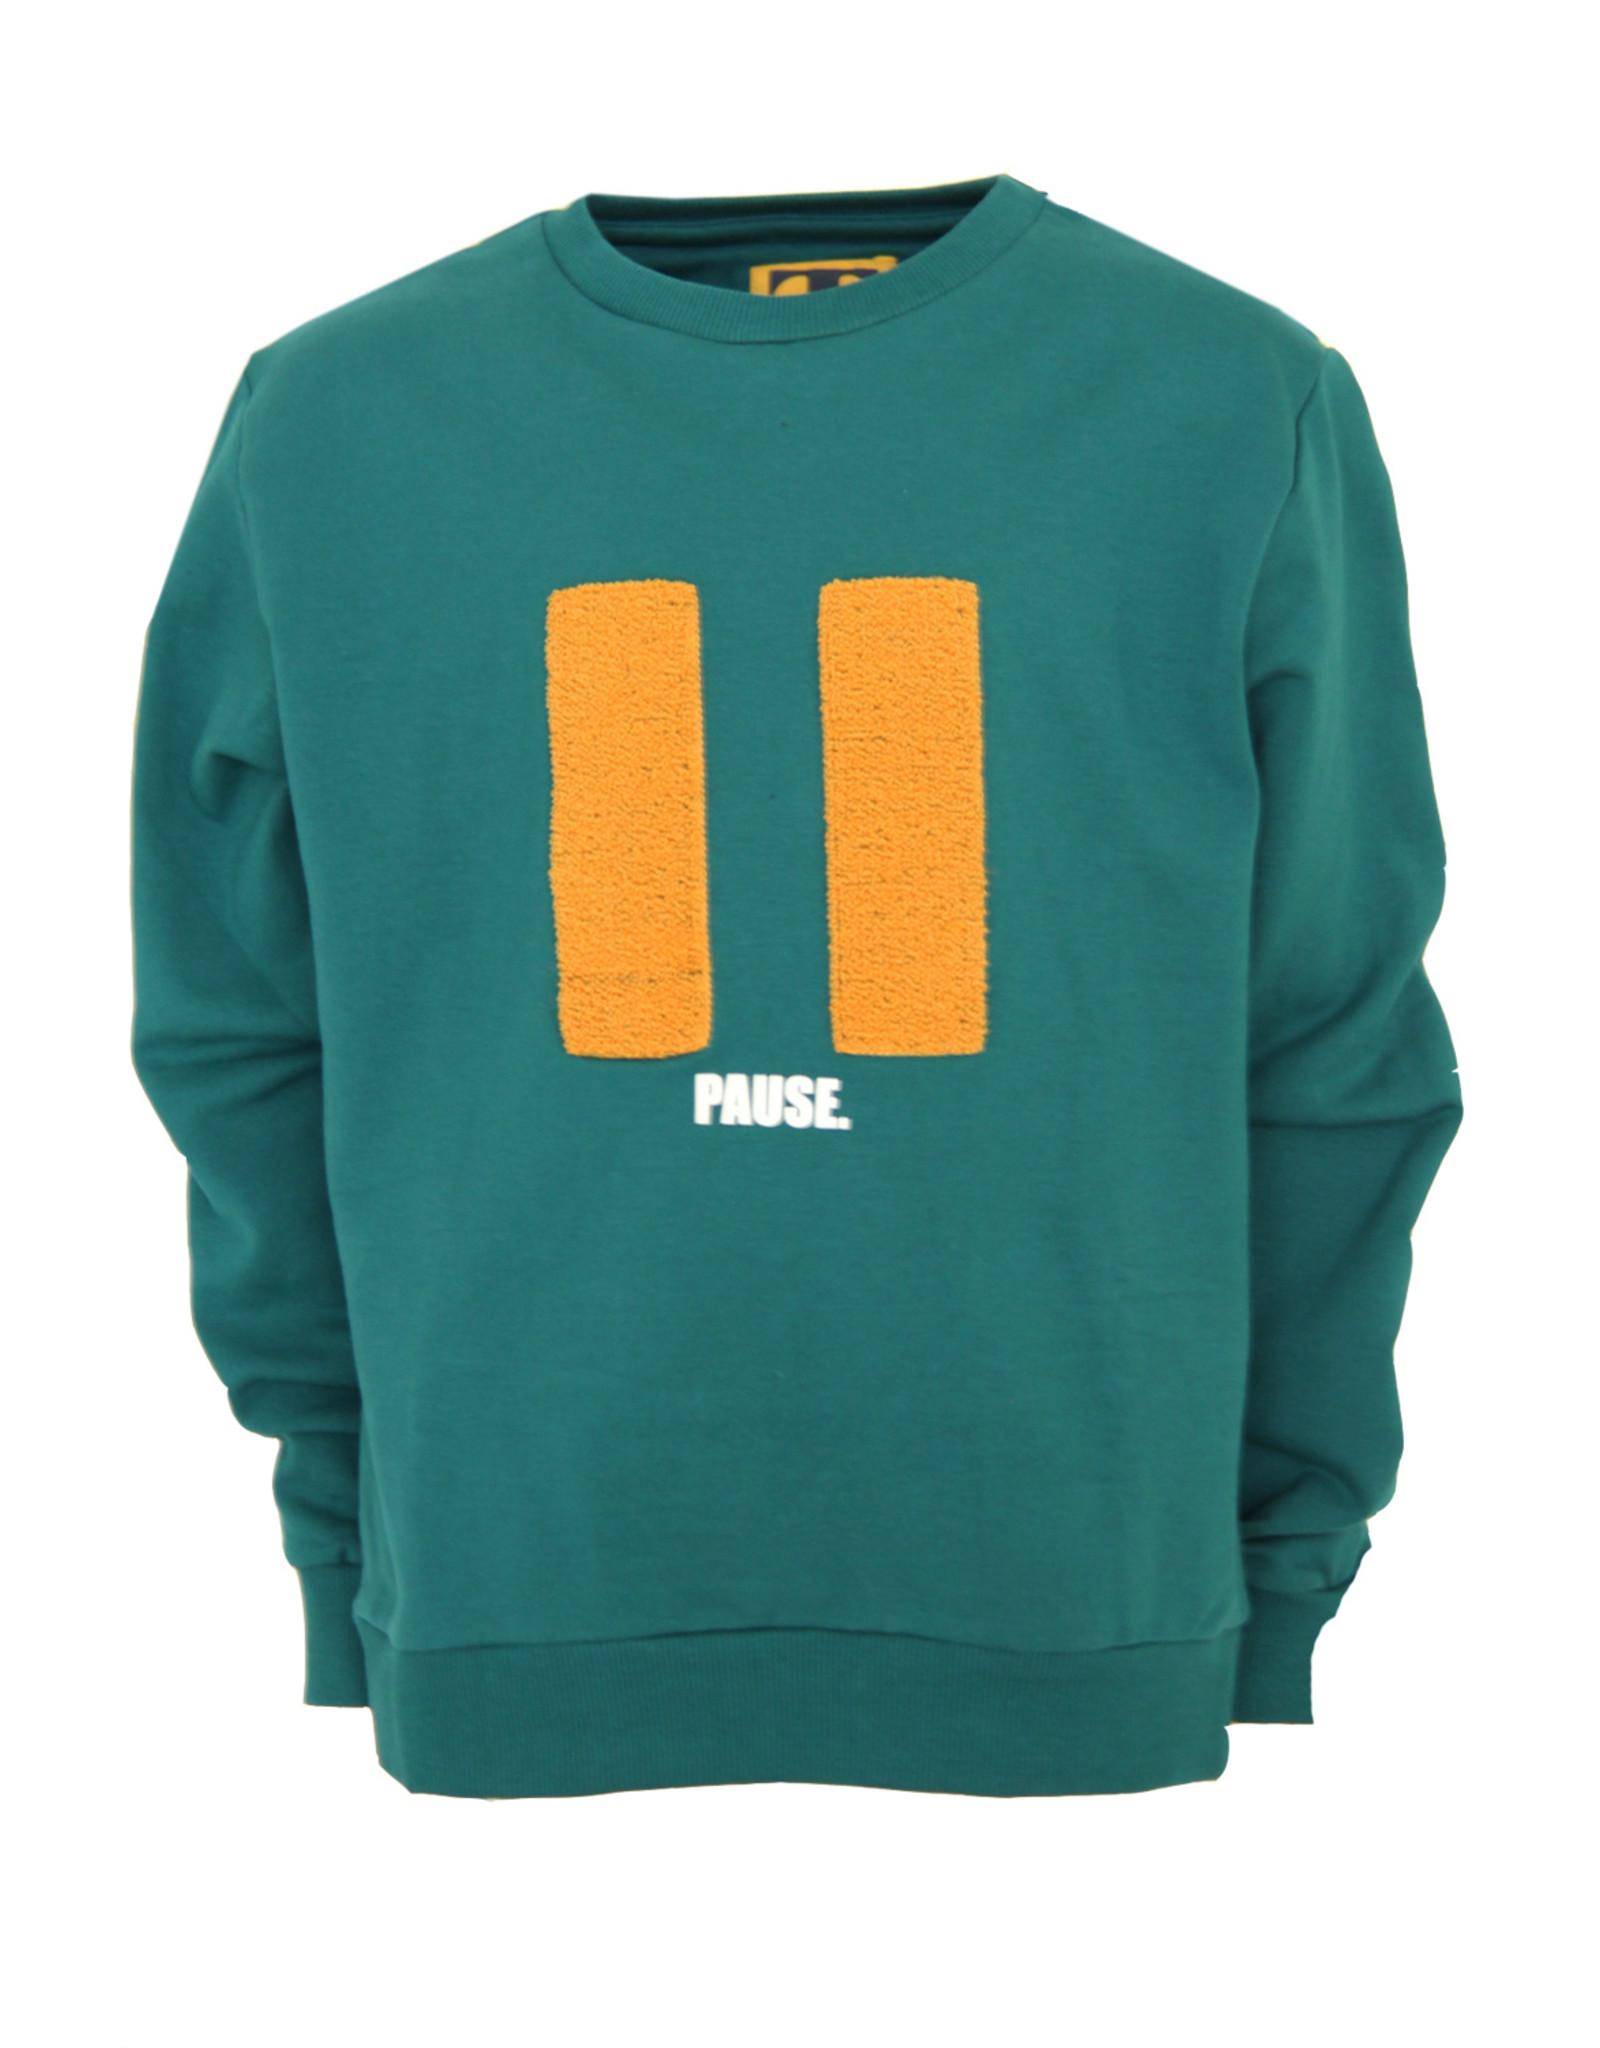 Topitm Sweater Tom  green